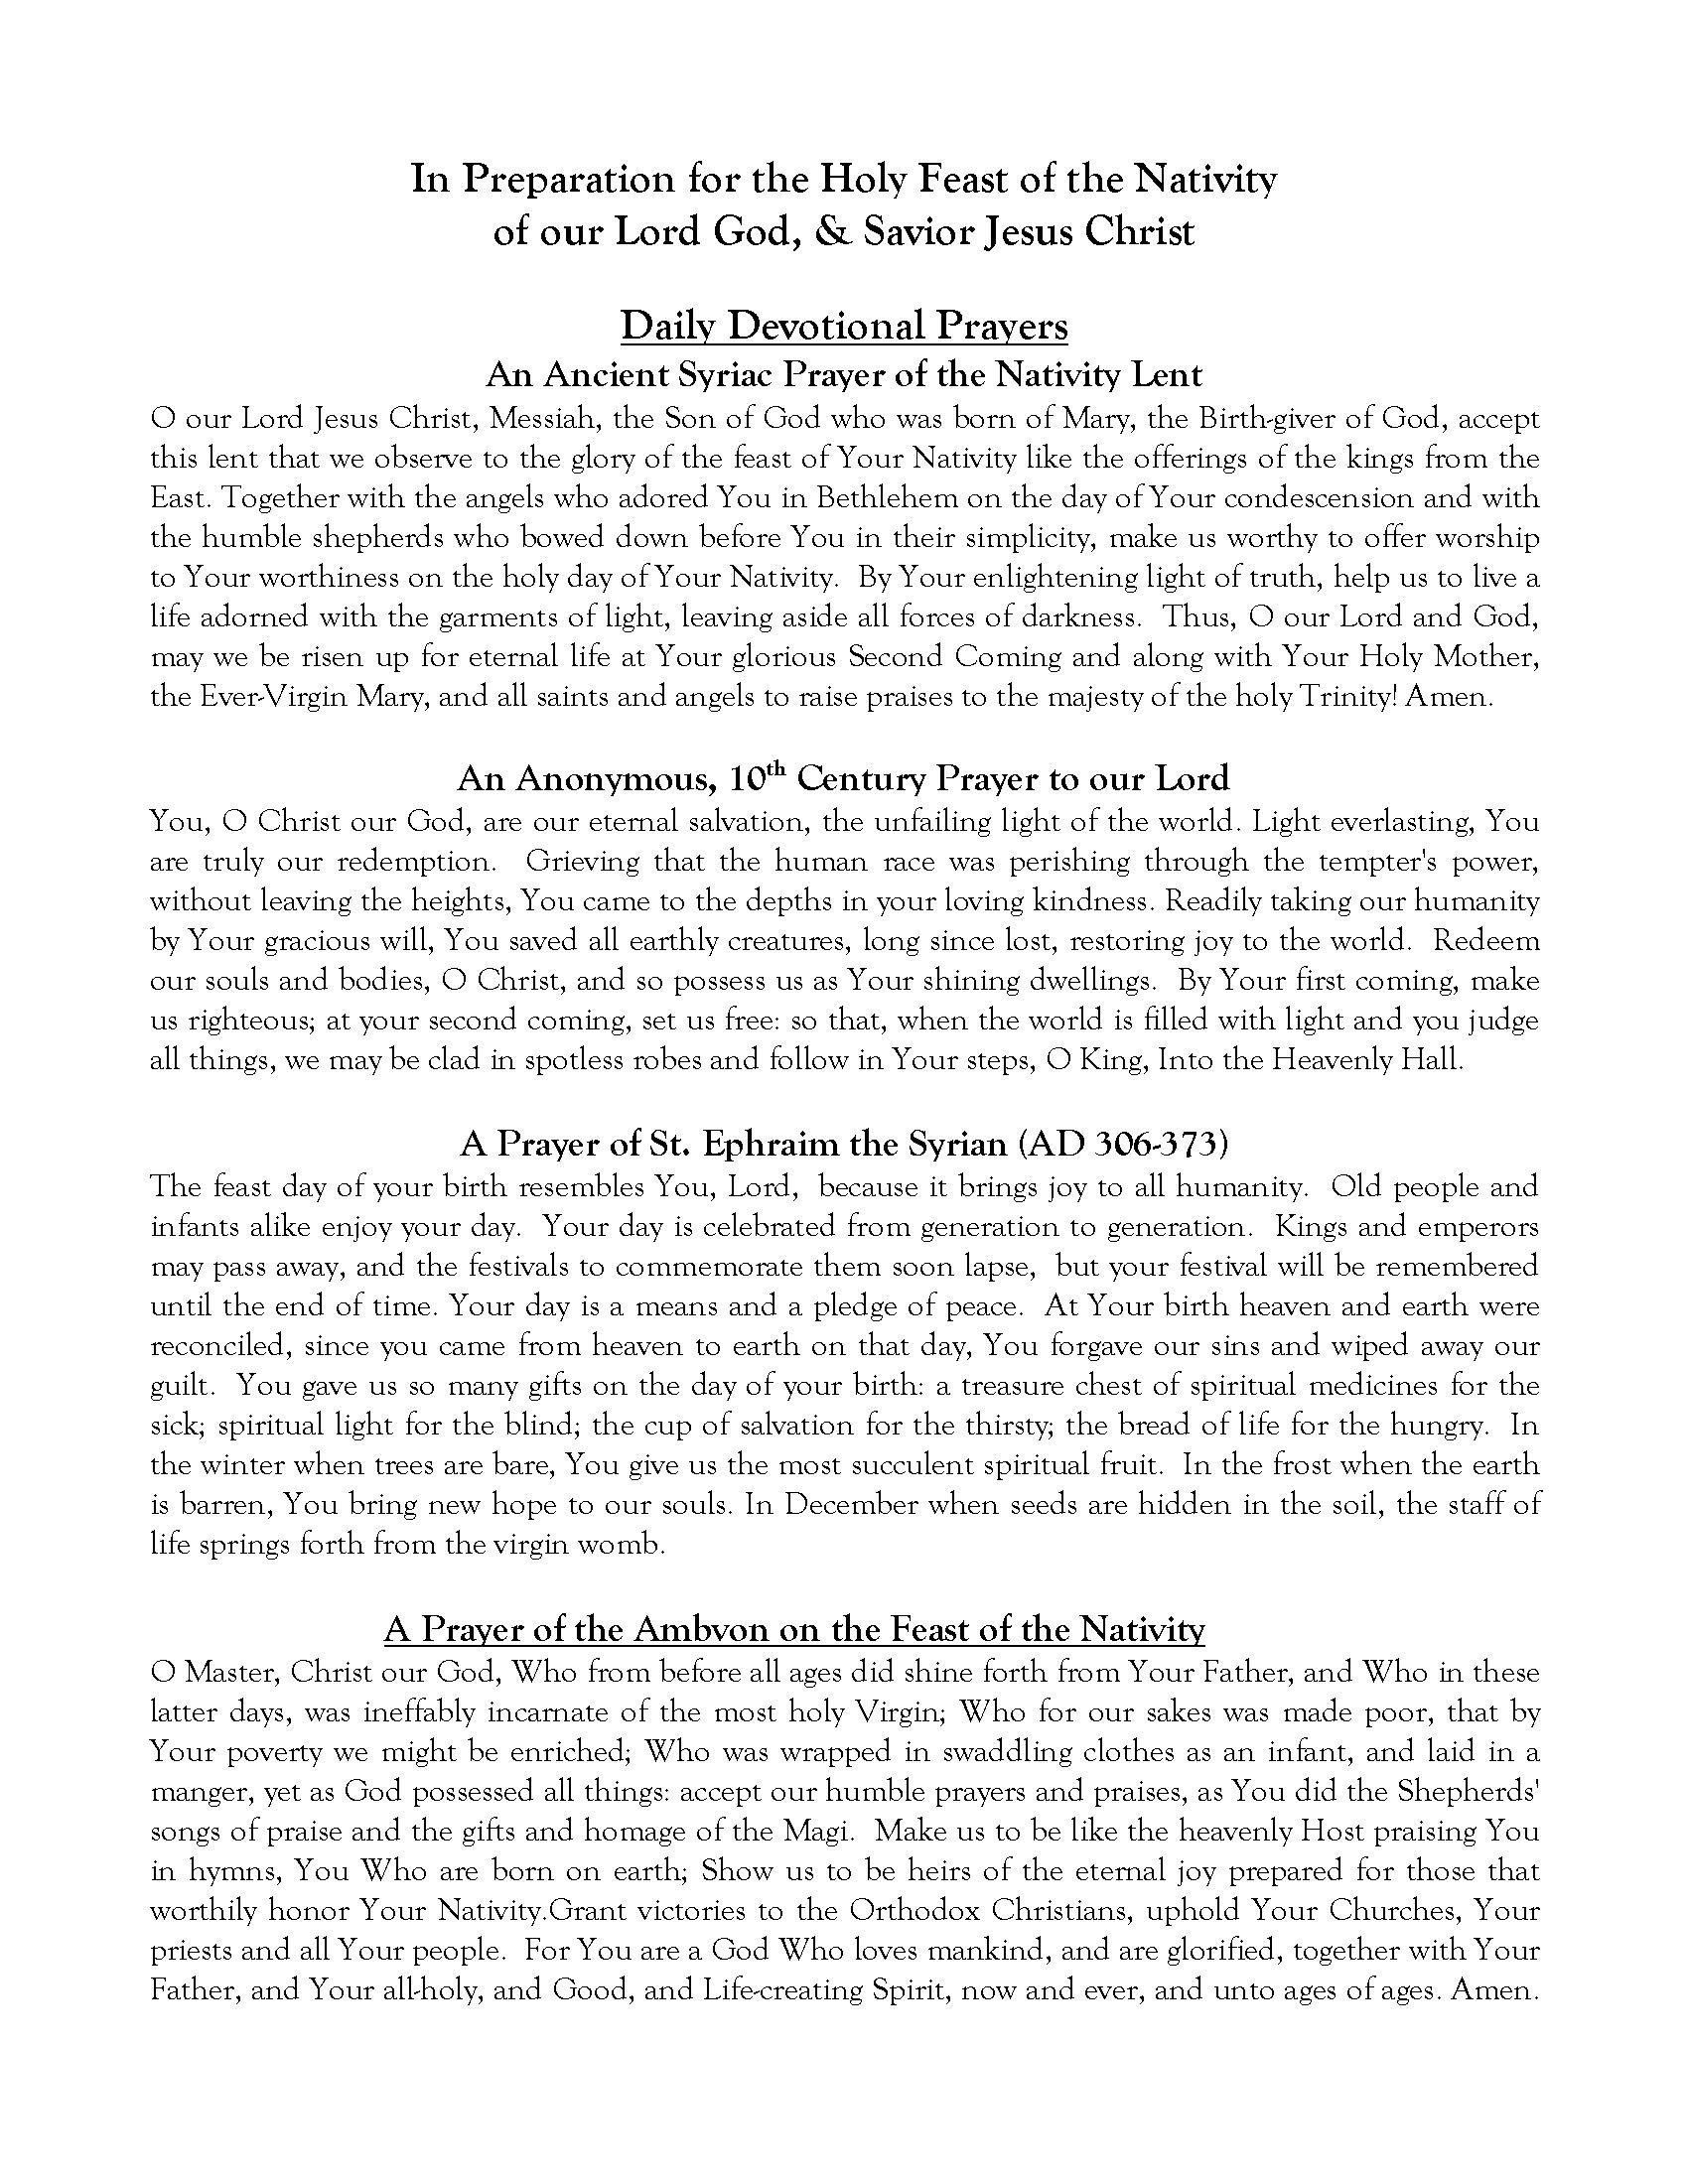 Nativity Fast 2017_Page_1.jpg